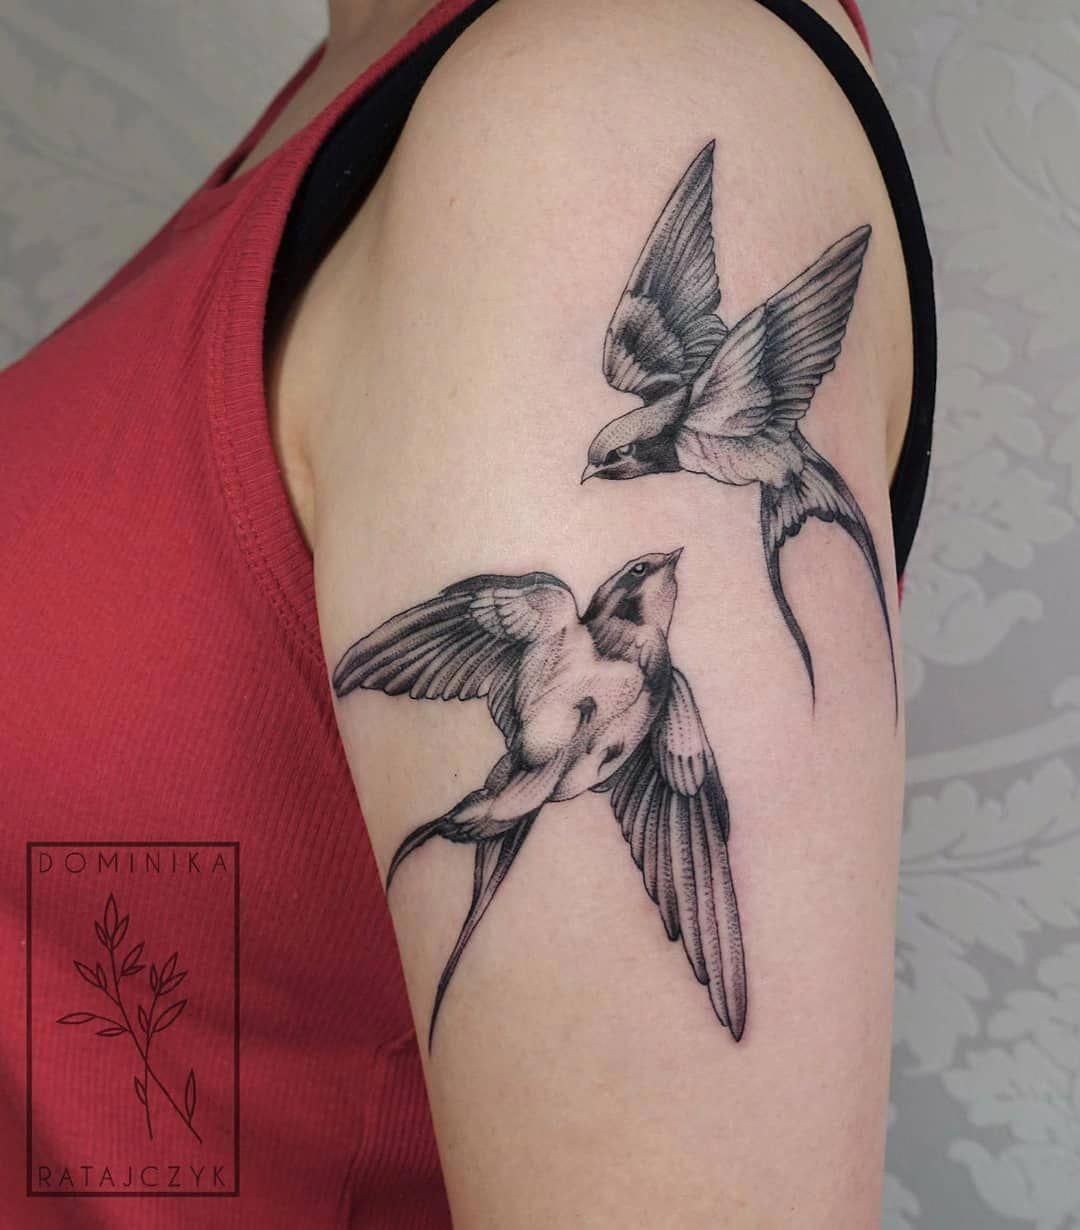 Tattoos For Men Back Tattoosformen Bird Tattoos Arm Birds Tattoo Tattoos For Guys